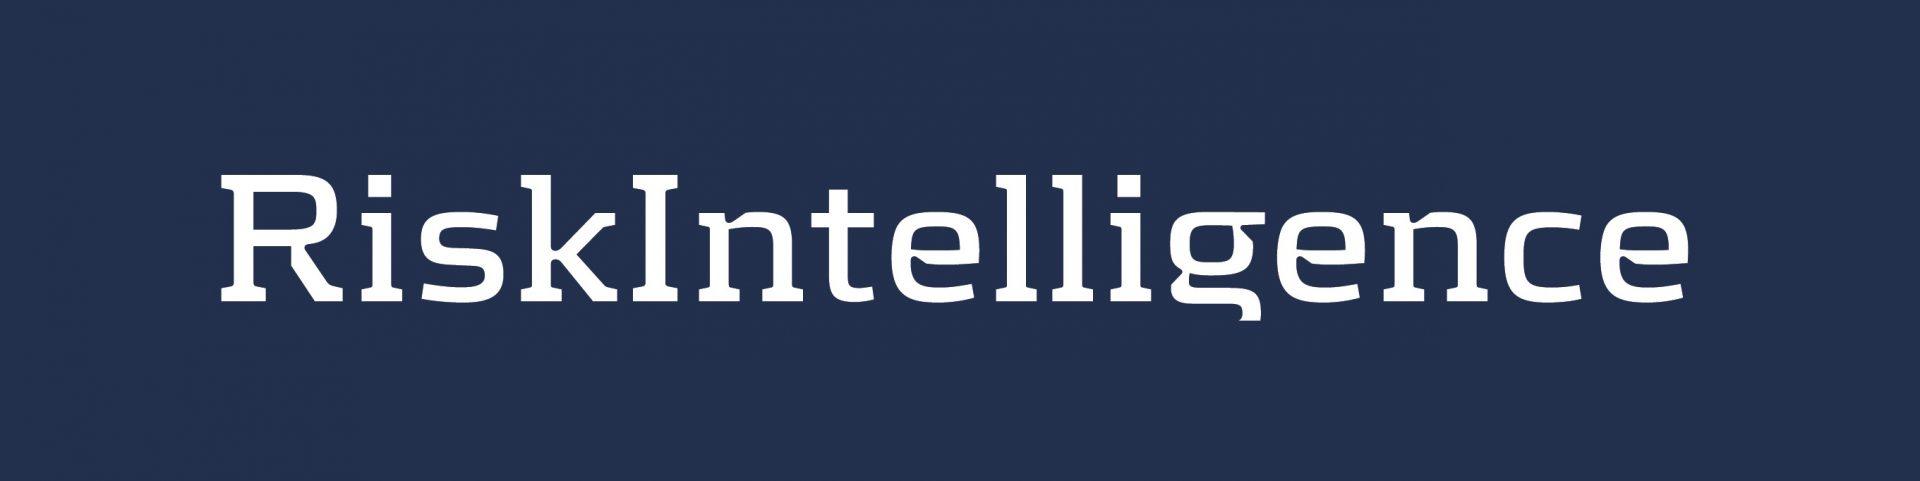 risk-intelligence-logo-square